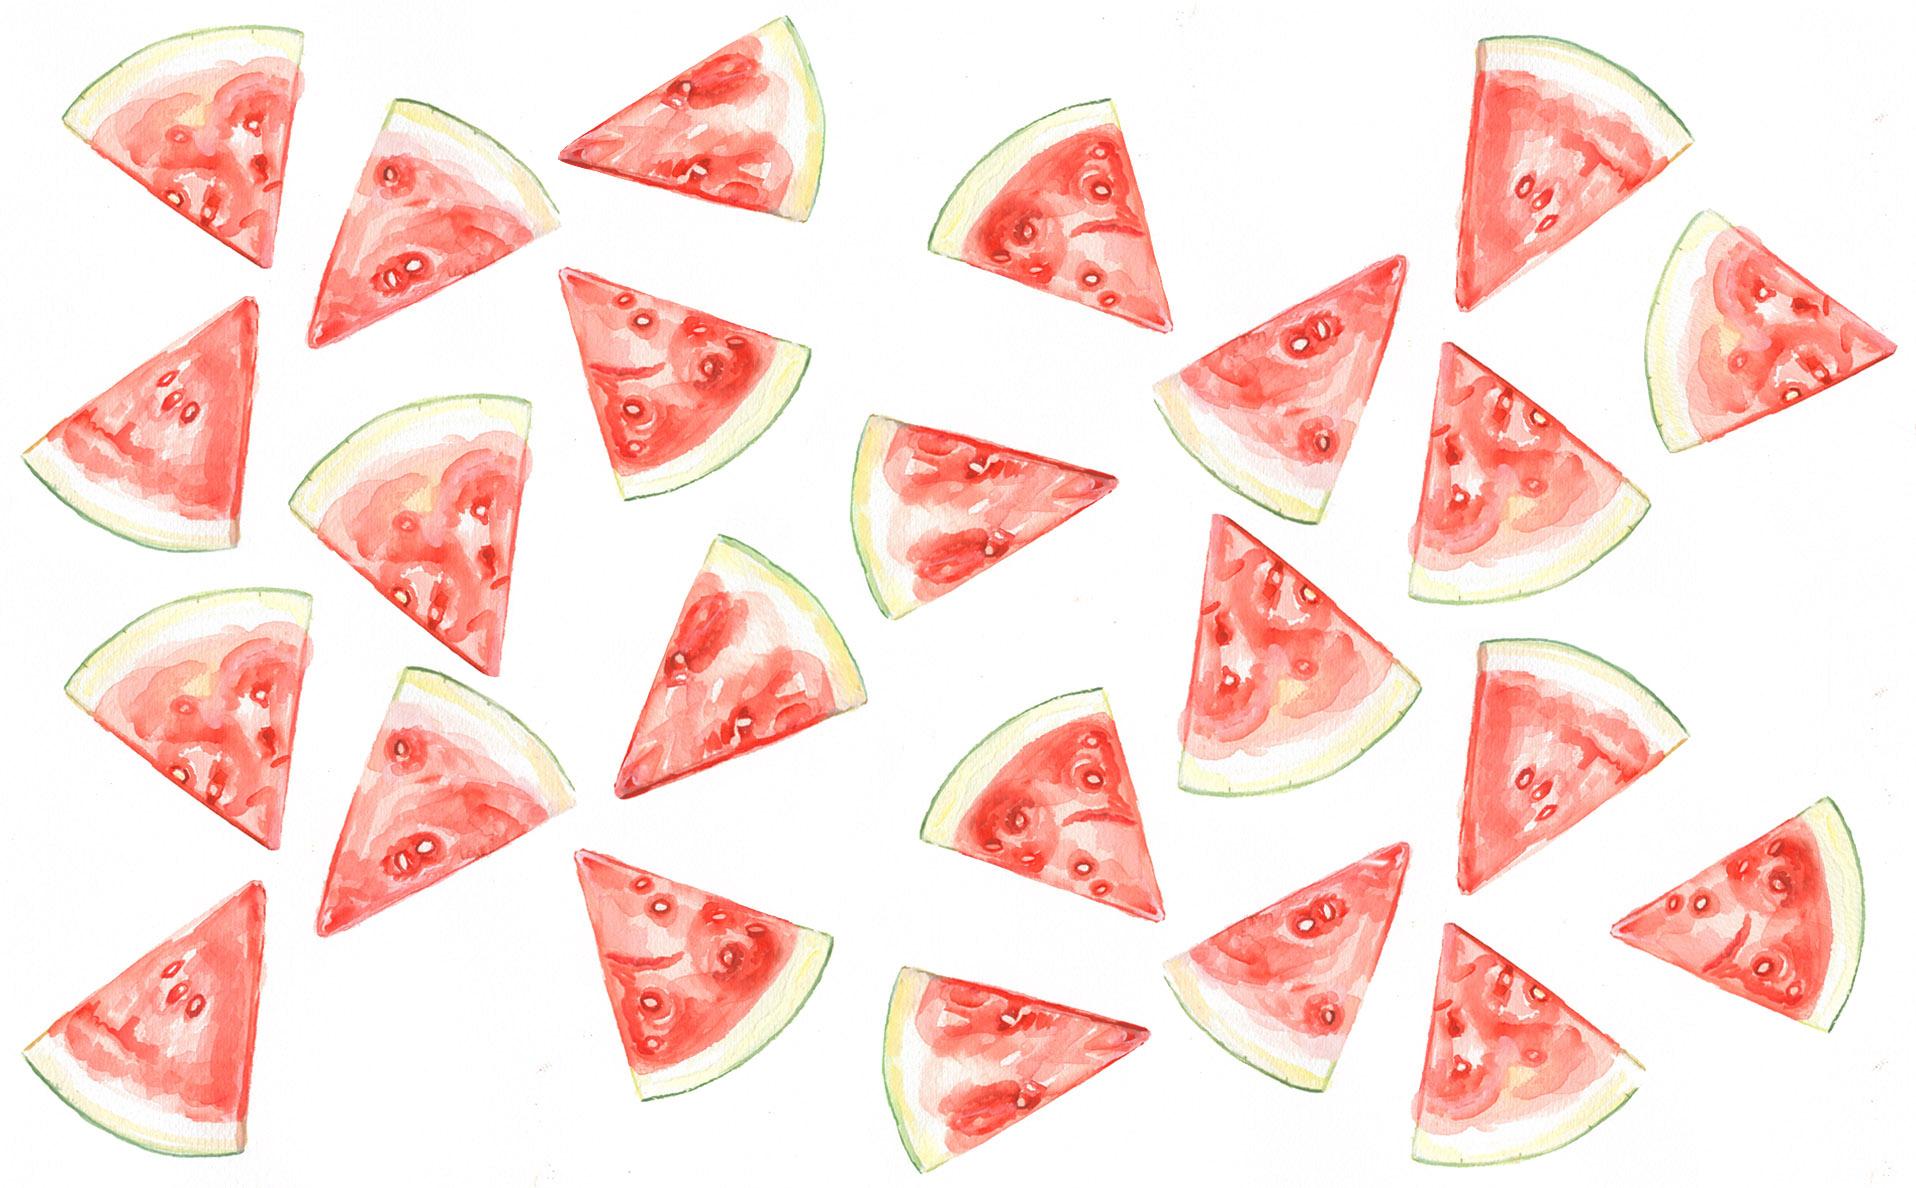 Cute Cactus Wallpaper Macbook Hd Watermelon Backgrounds Pixelstalk Net